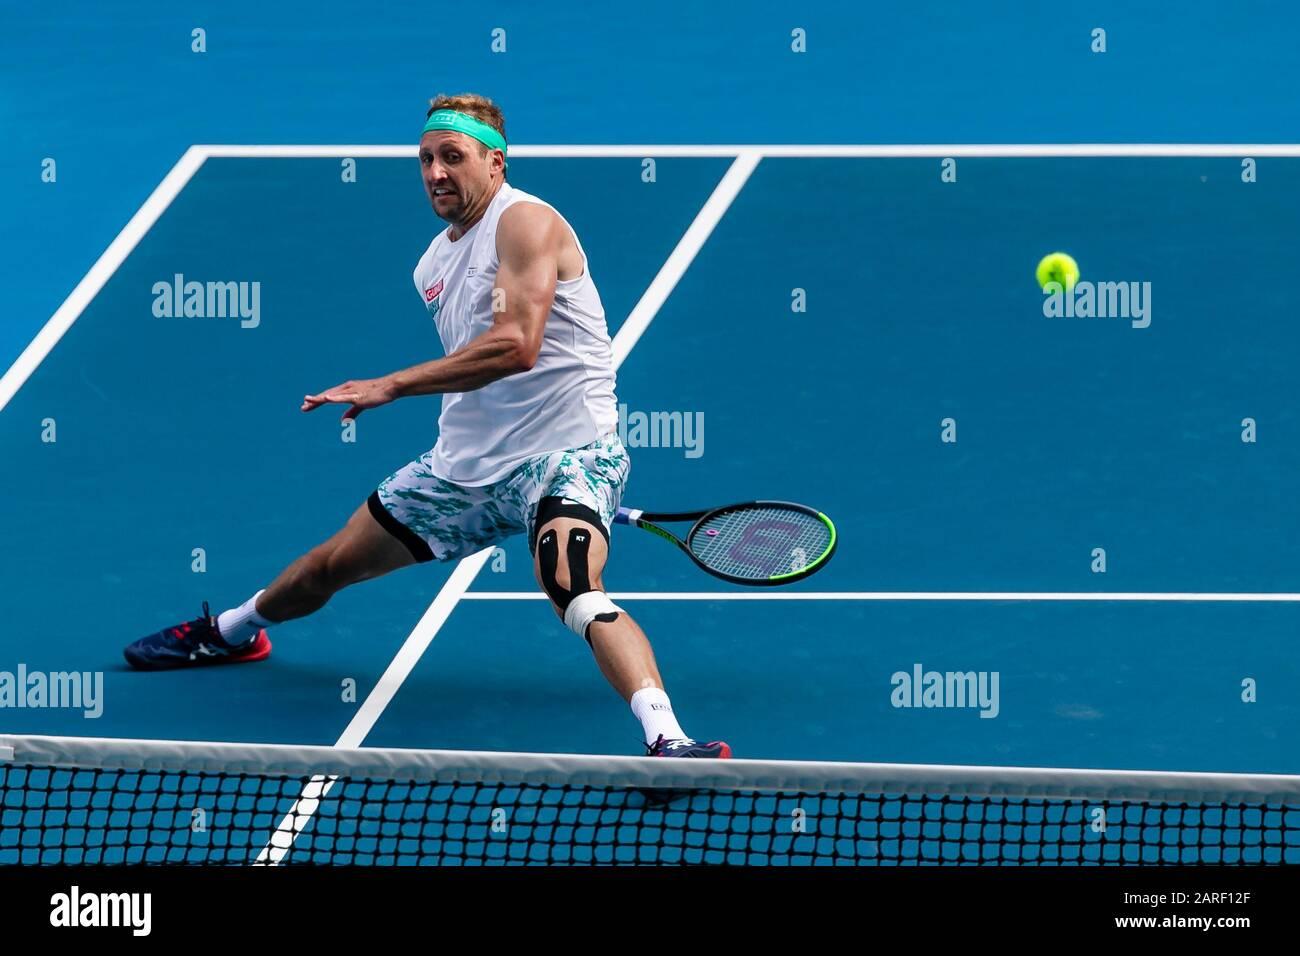 Melbourne, Australien. Januar 2020. Tennis: Grand Slam, Australian Open. Herren, Einzel, Sechzehner-Runde, Sandgren (USA) - Federer (Schweiz). Tennis-Sandgren ist in Aktion. Credit: Frank Molter / dpa / Alamy Live News Stockfoto